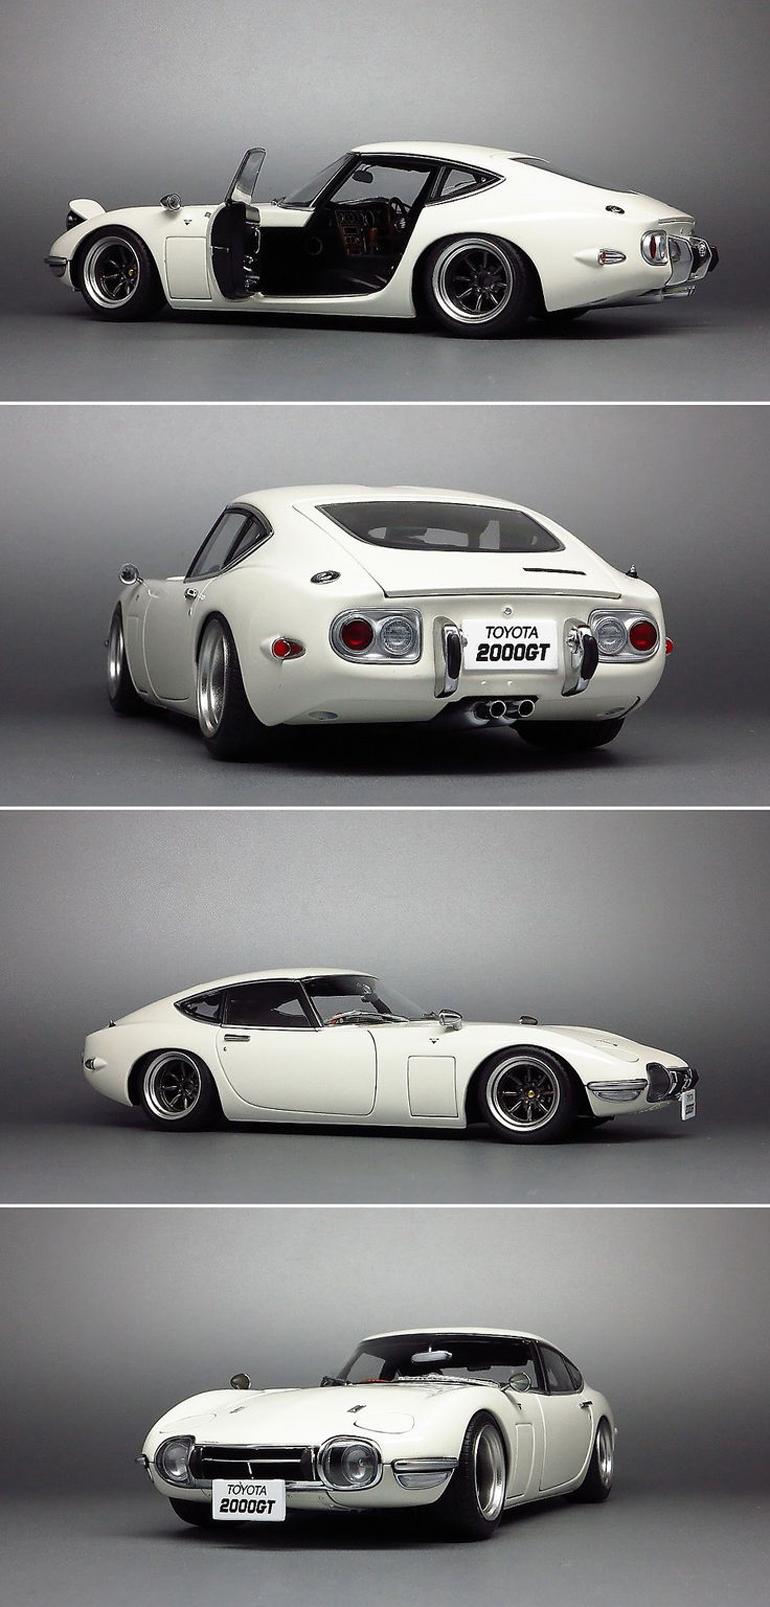 artcar-1-18-scale-toyota-2000gt-model-car